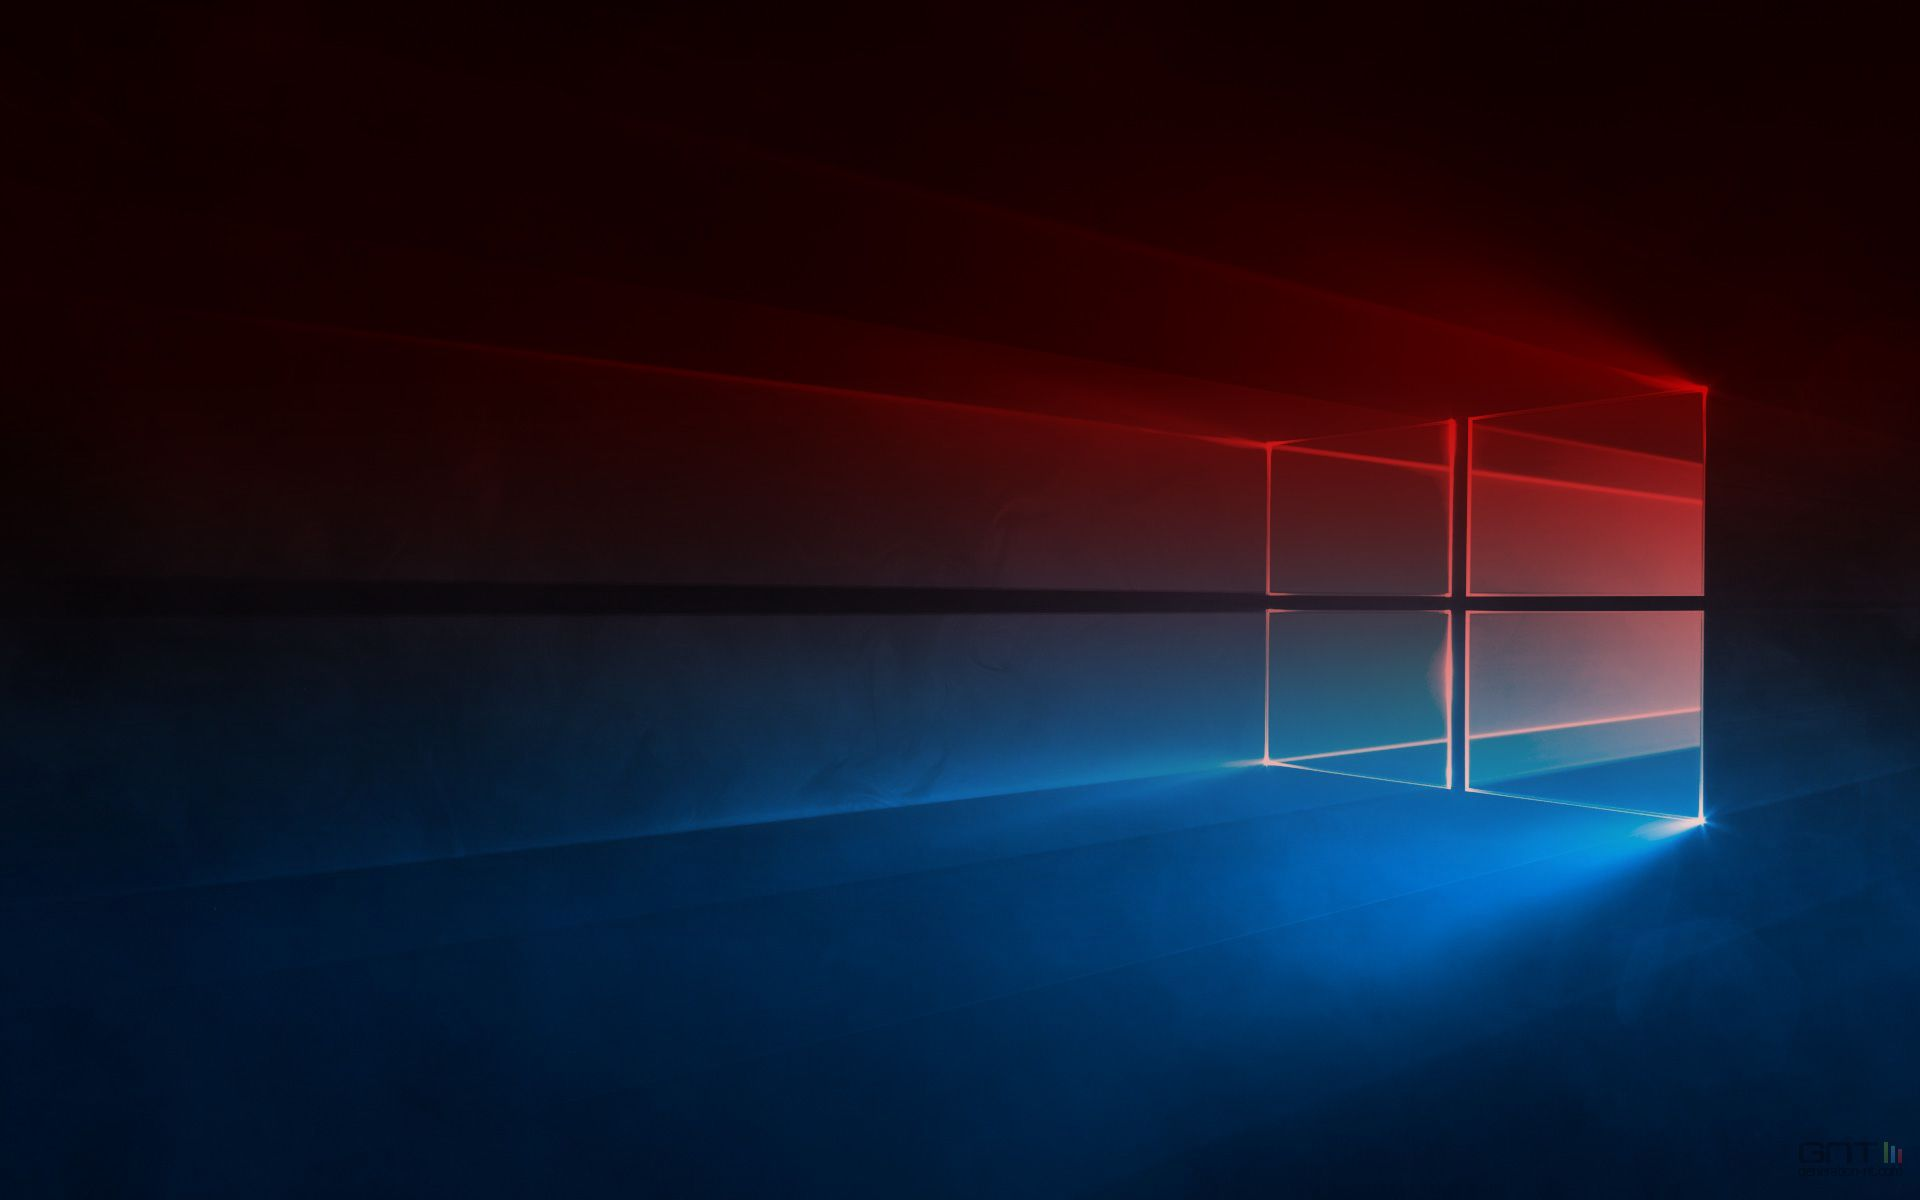 Windows 10 Black Logo On Red Wallpaper Red Wallpaper Cool Desktop Wallpapers Hd Wallpapers For Pc